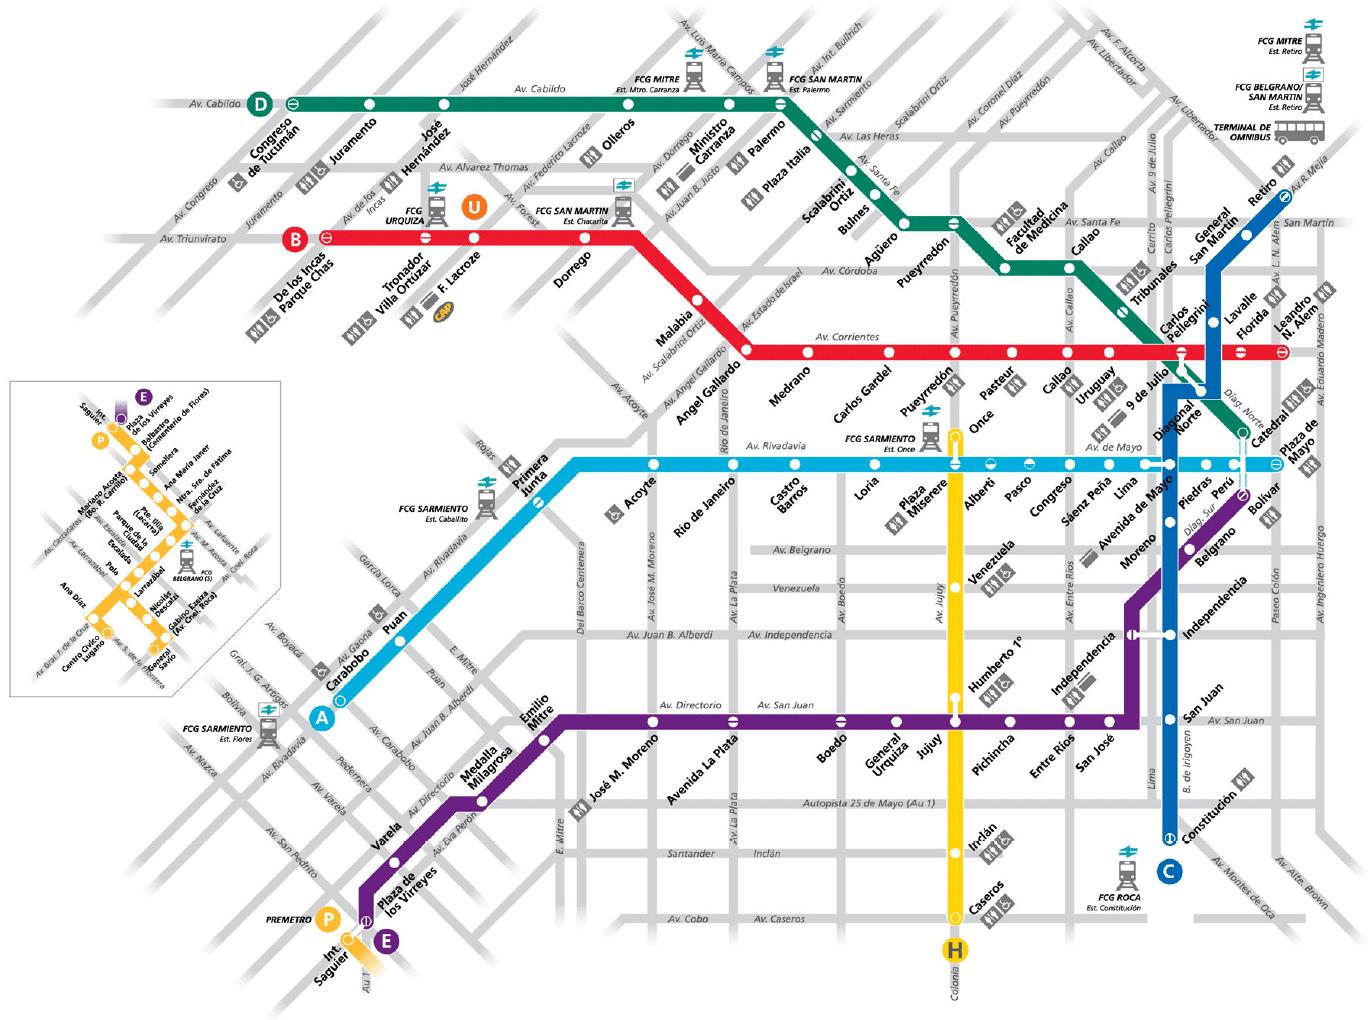 Mapa Subte Buenos Aires Argentina Horarios sábado domingo